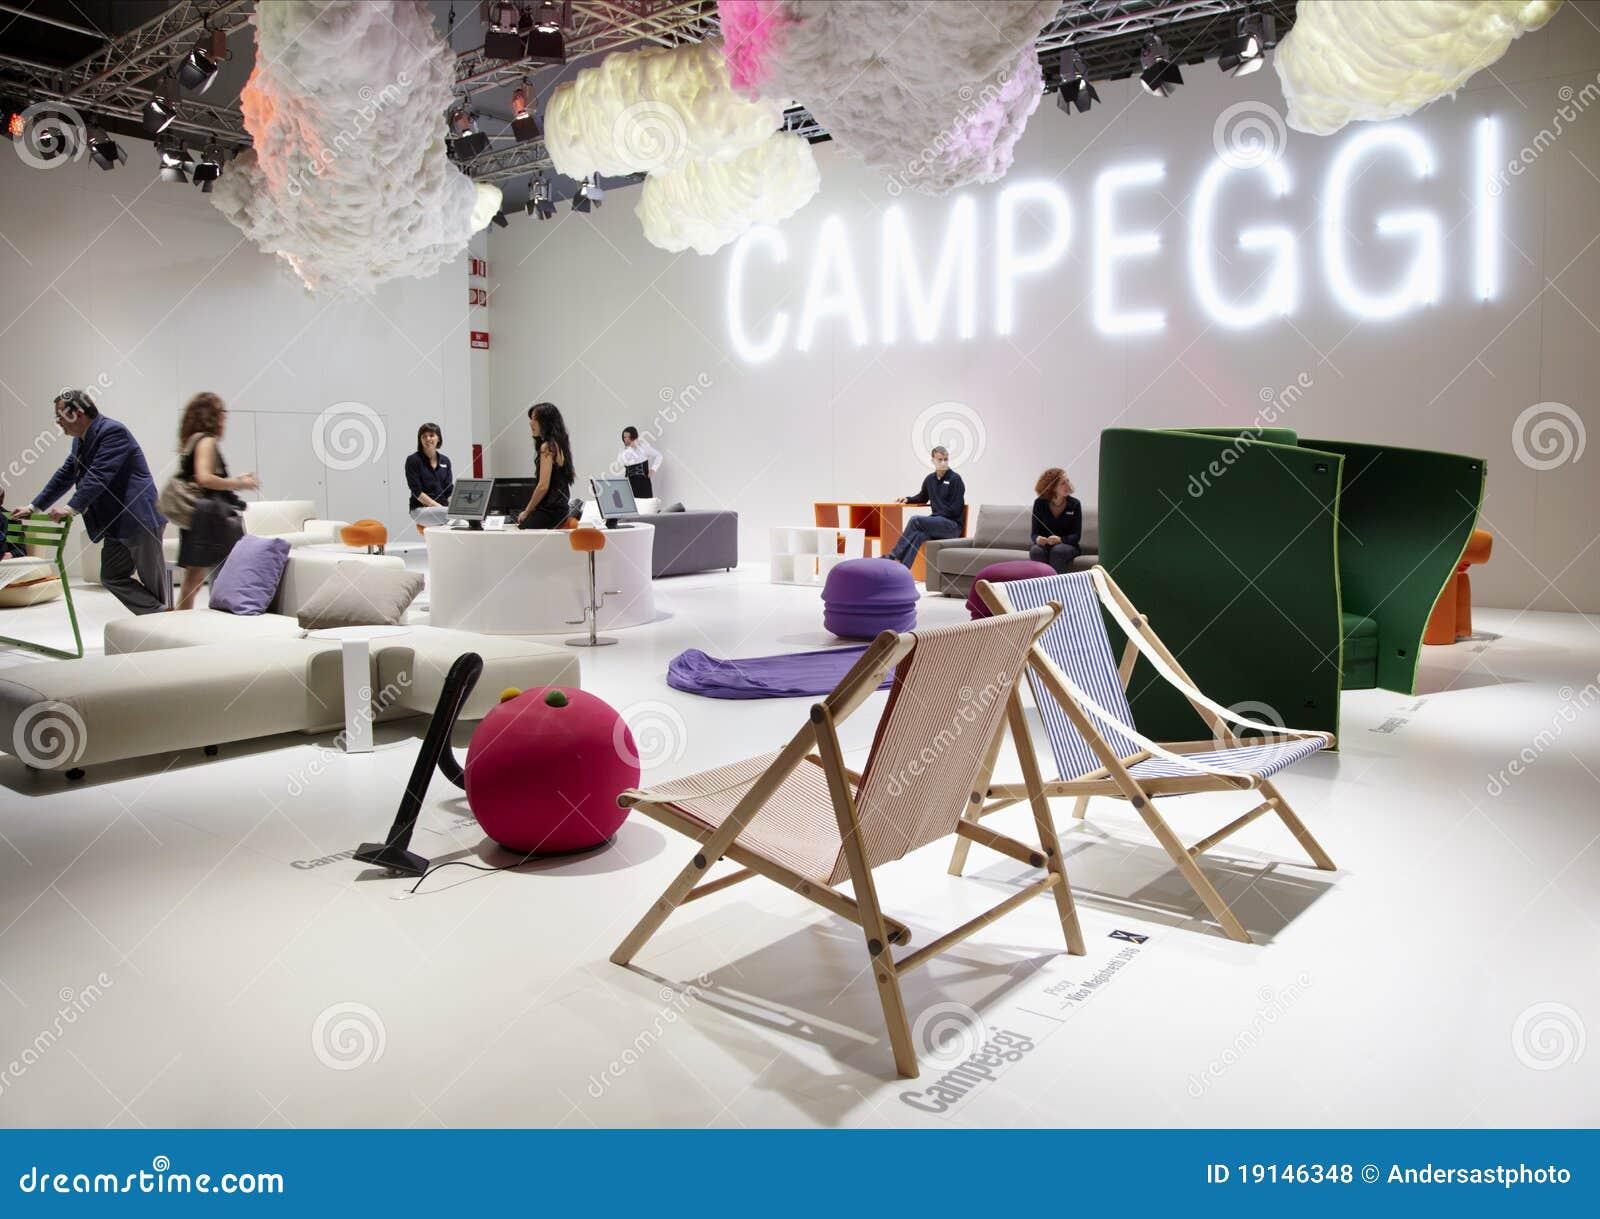 Salone Del Mobile Milan Furniture Fair 2011 Editorial